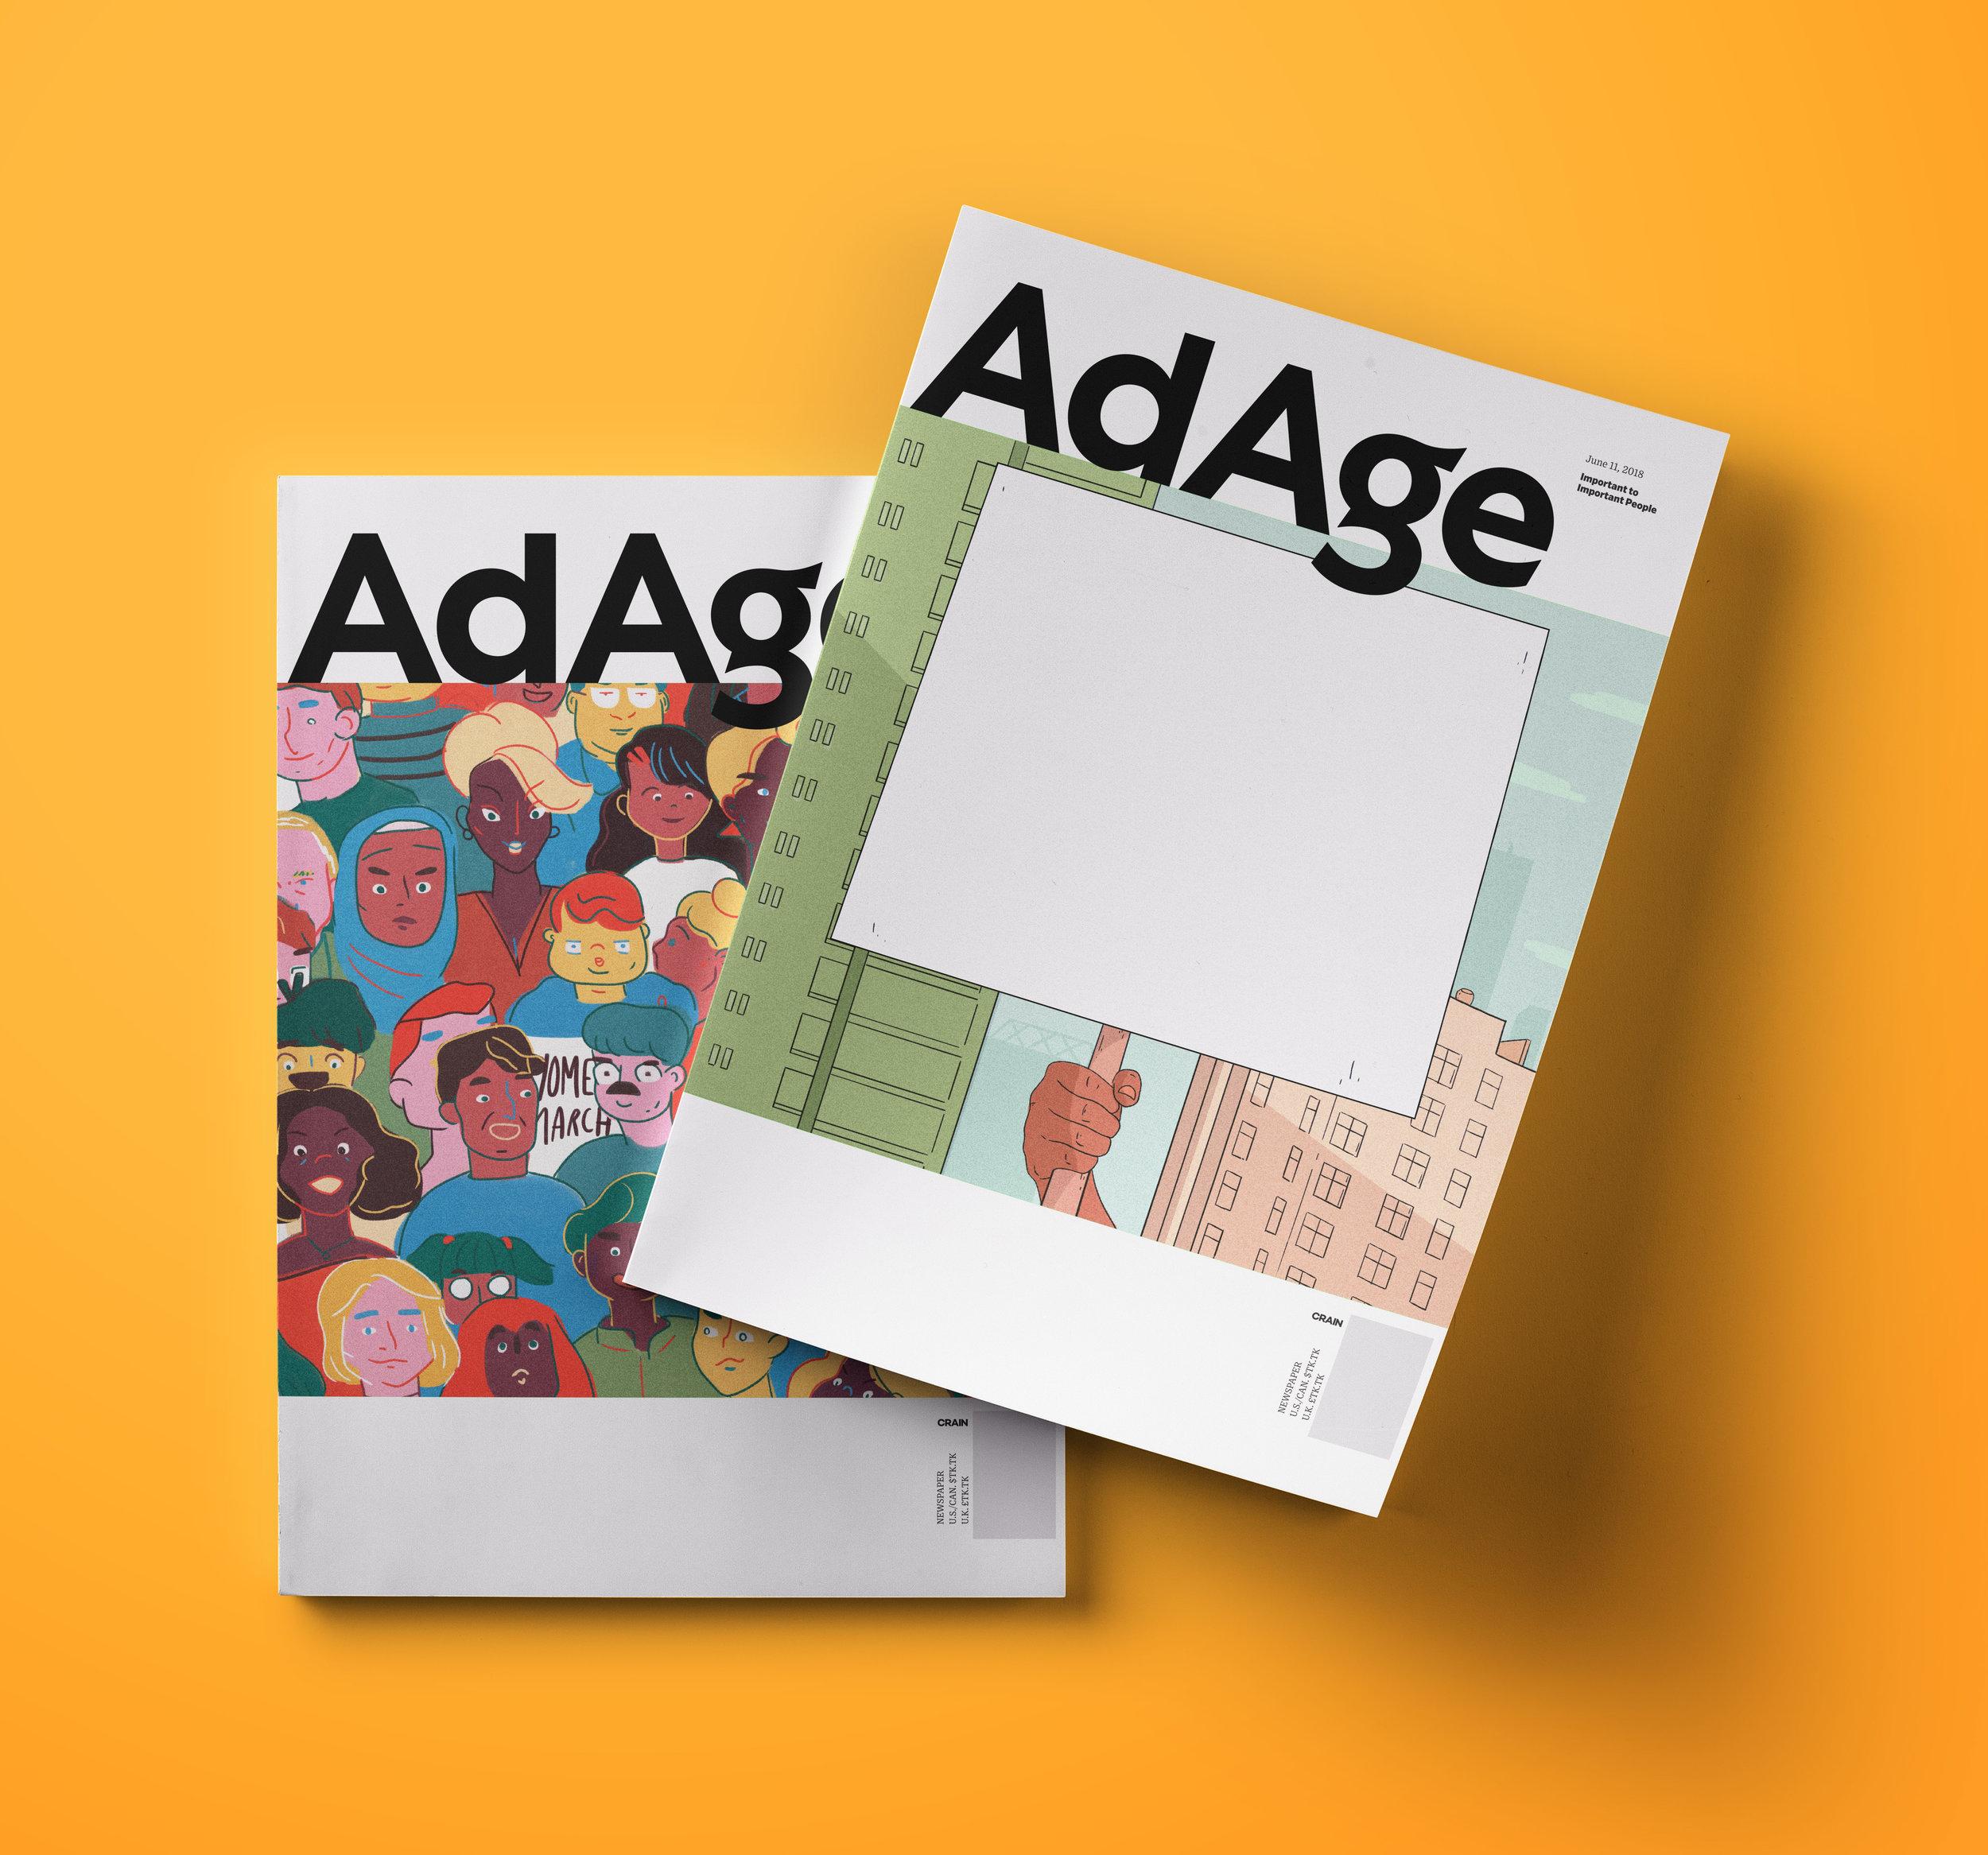 adadge.jpg